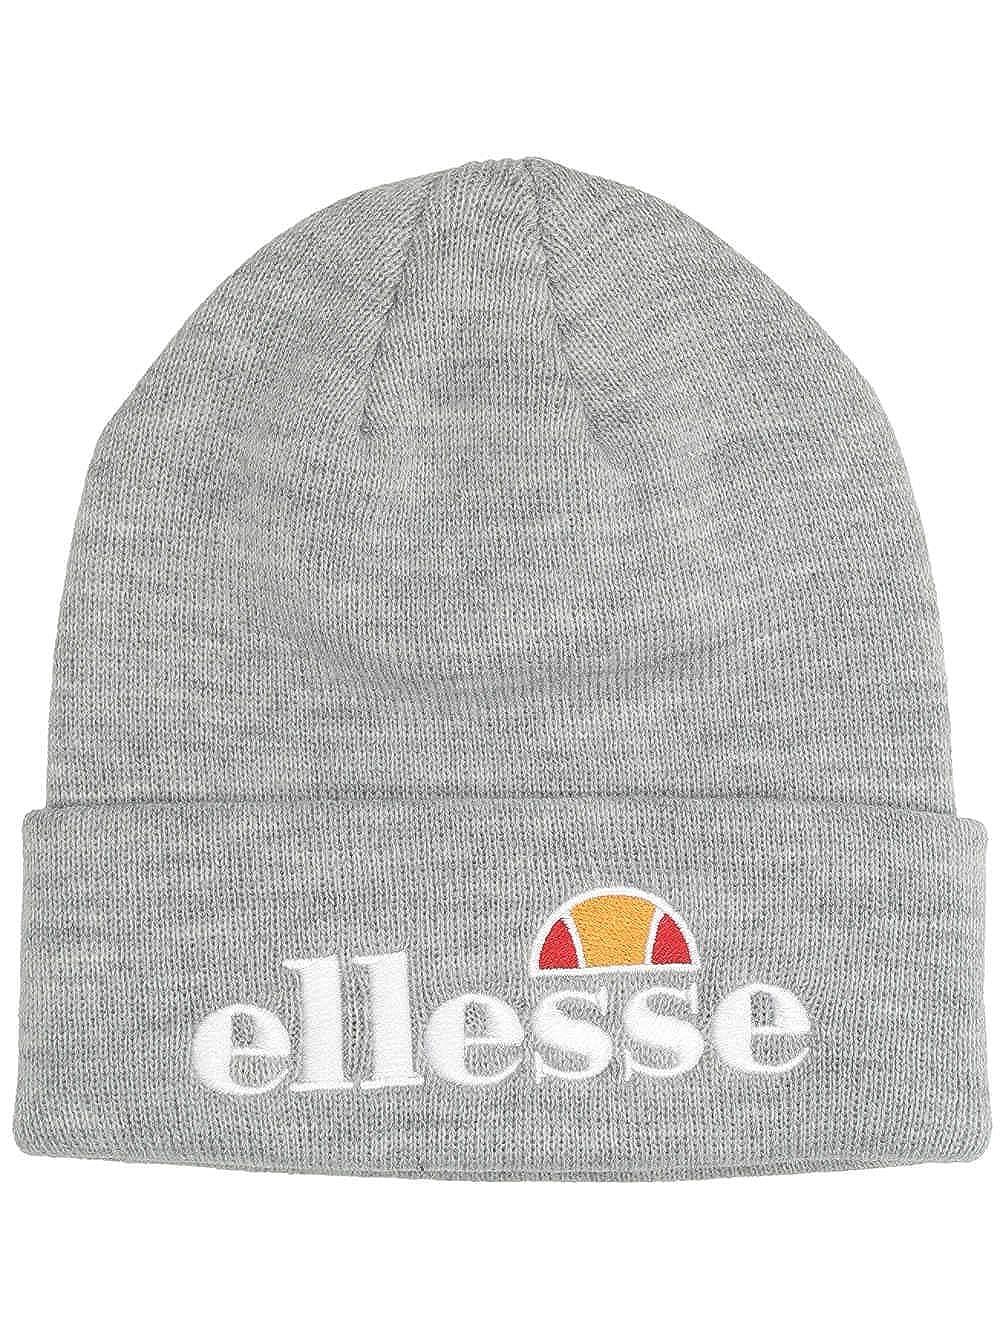 27e5128aa ELLESSE BEANIE VELLY BLACK FINE KNIT LOGO HAT